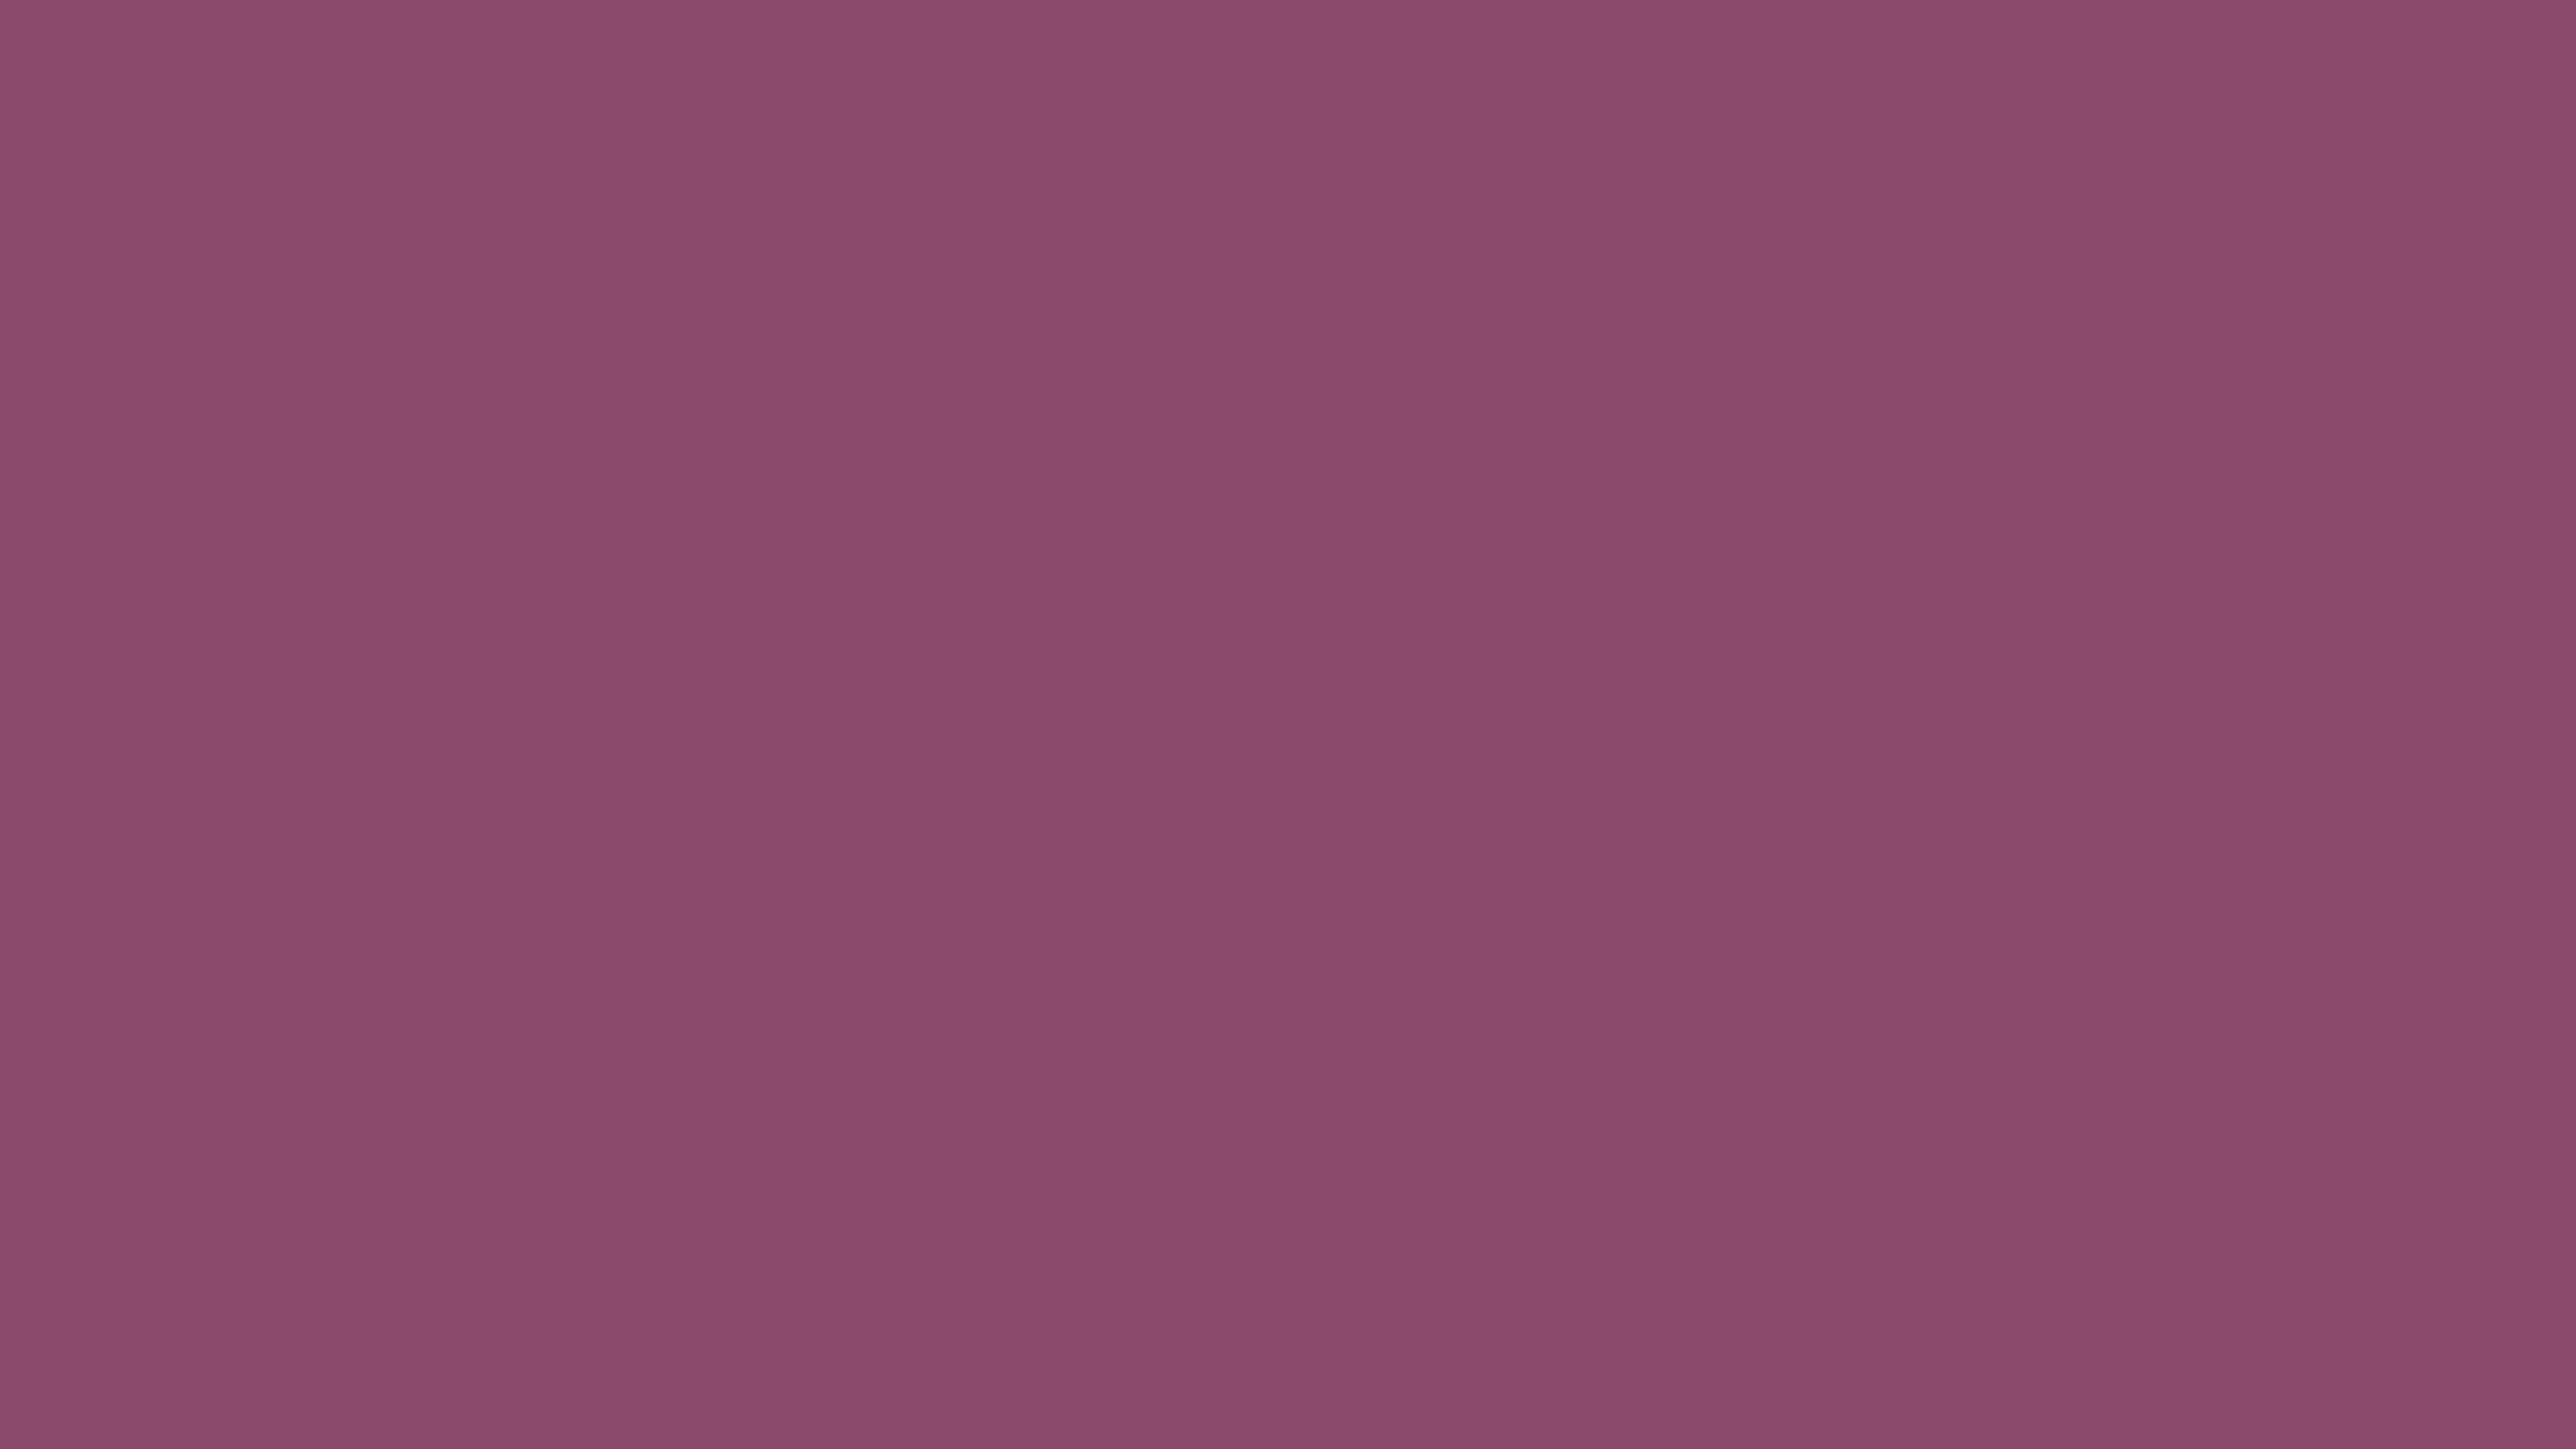 5120x2880 Twilight Lavender Solid Color Background